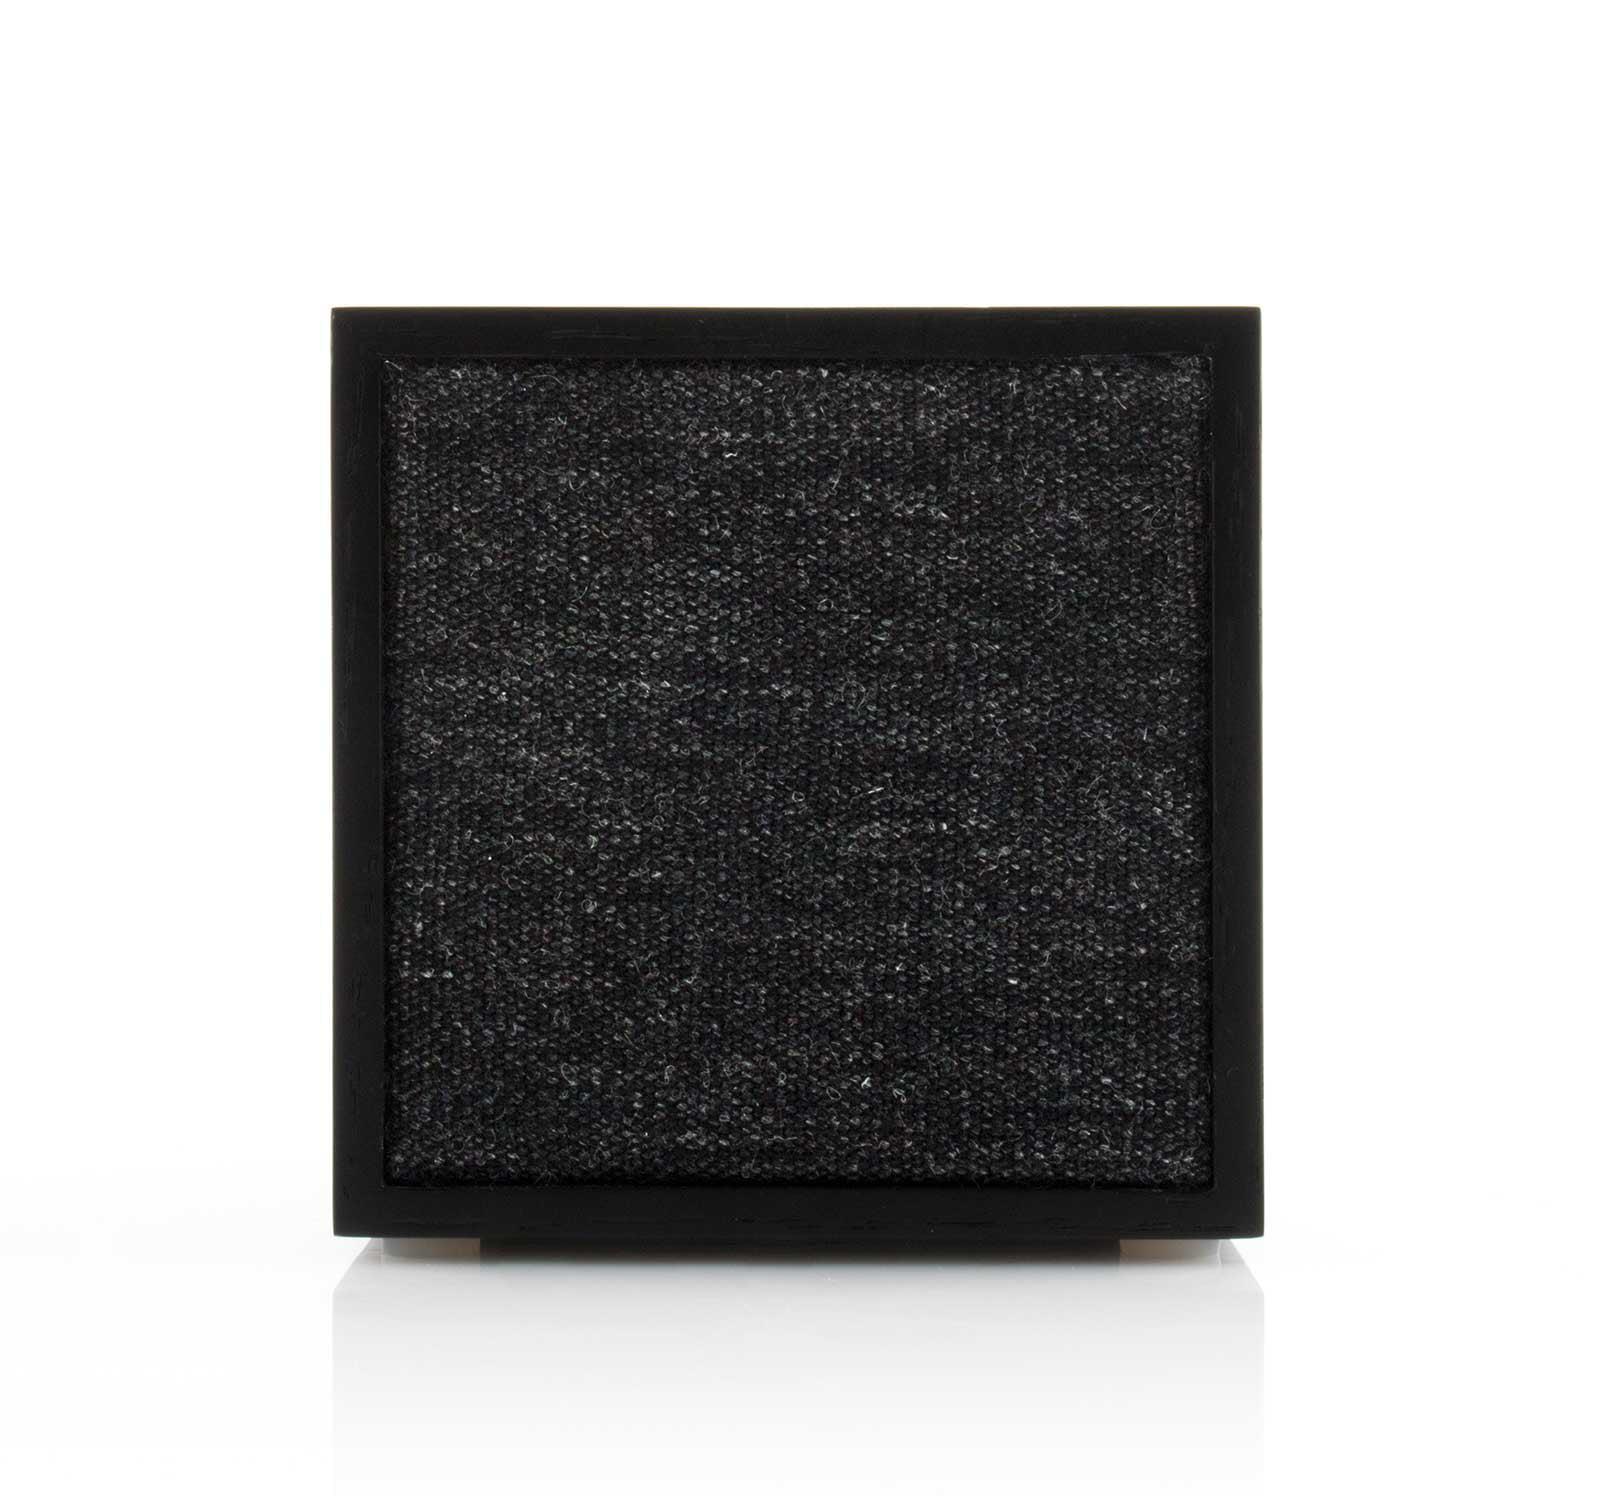 Tivoli CUBE Black Black Wireless Speaker by Tivoli